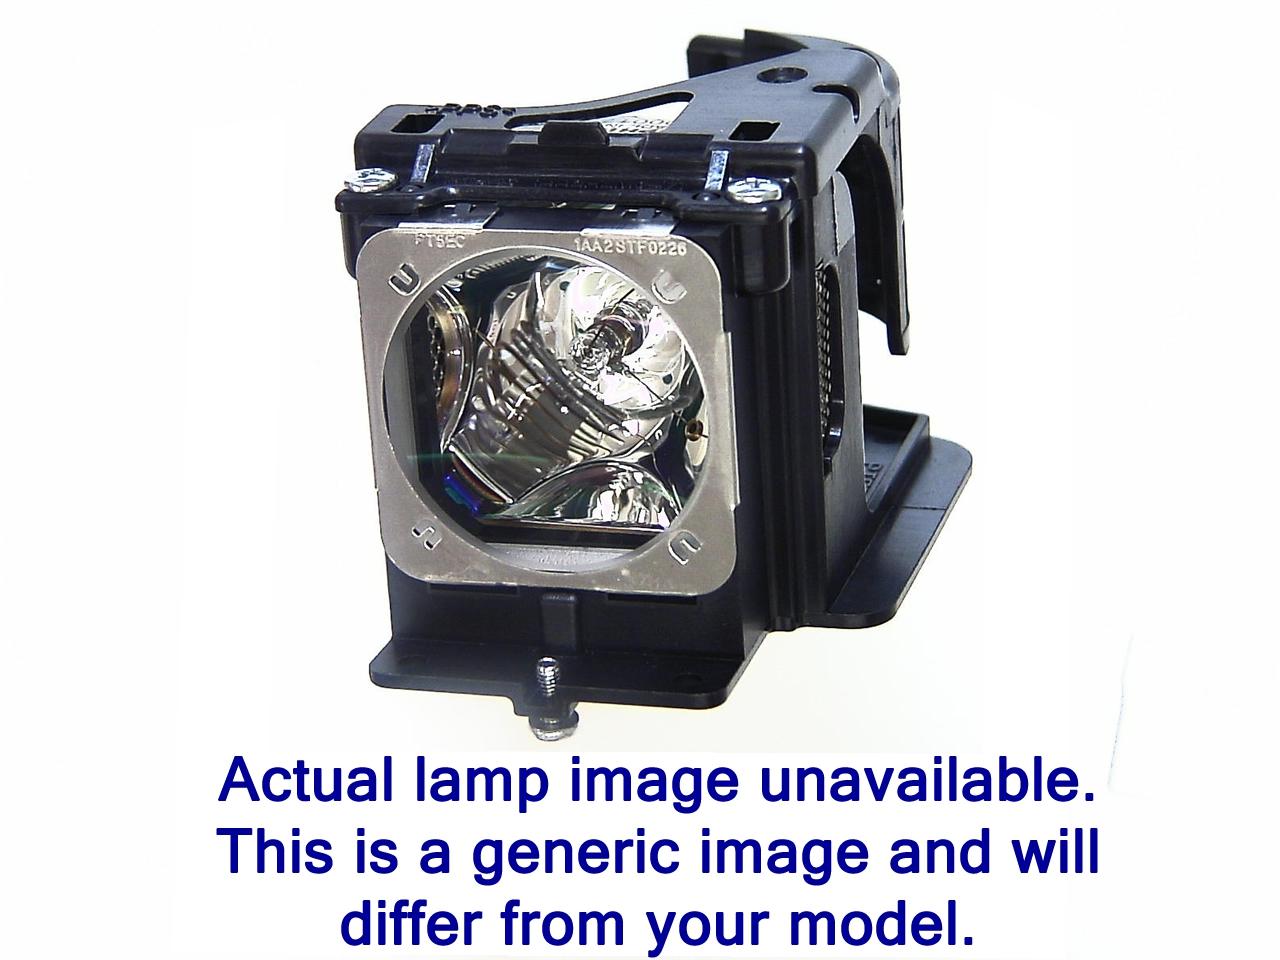 Lámpara LG RE-44SZ20RD